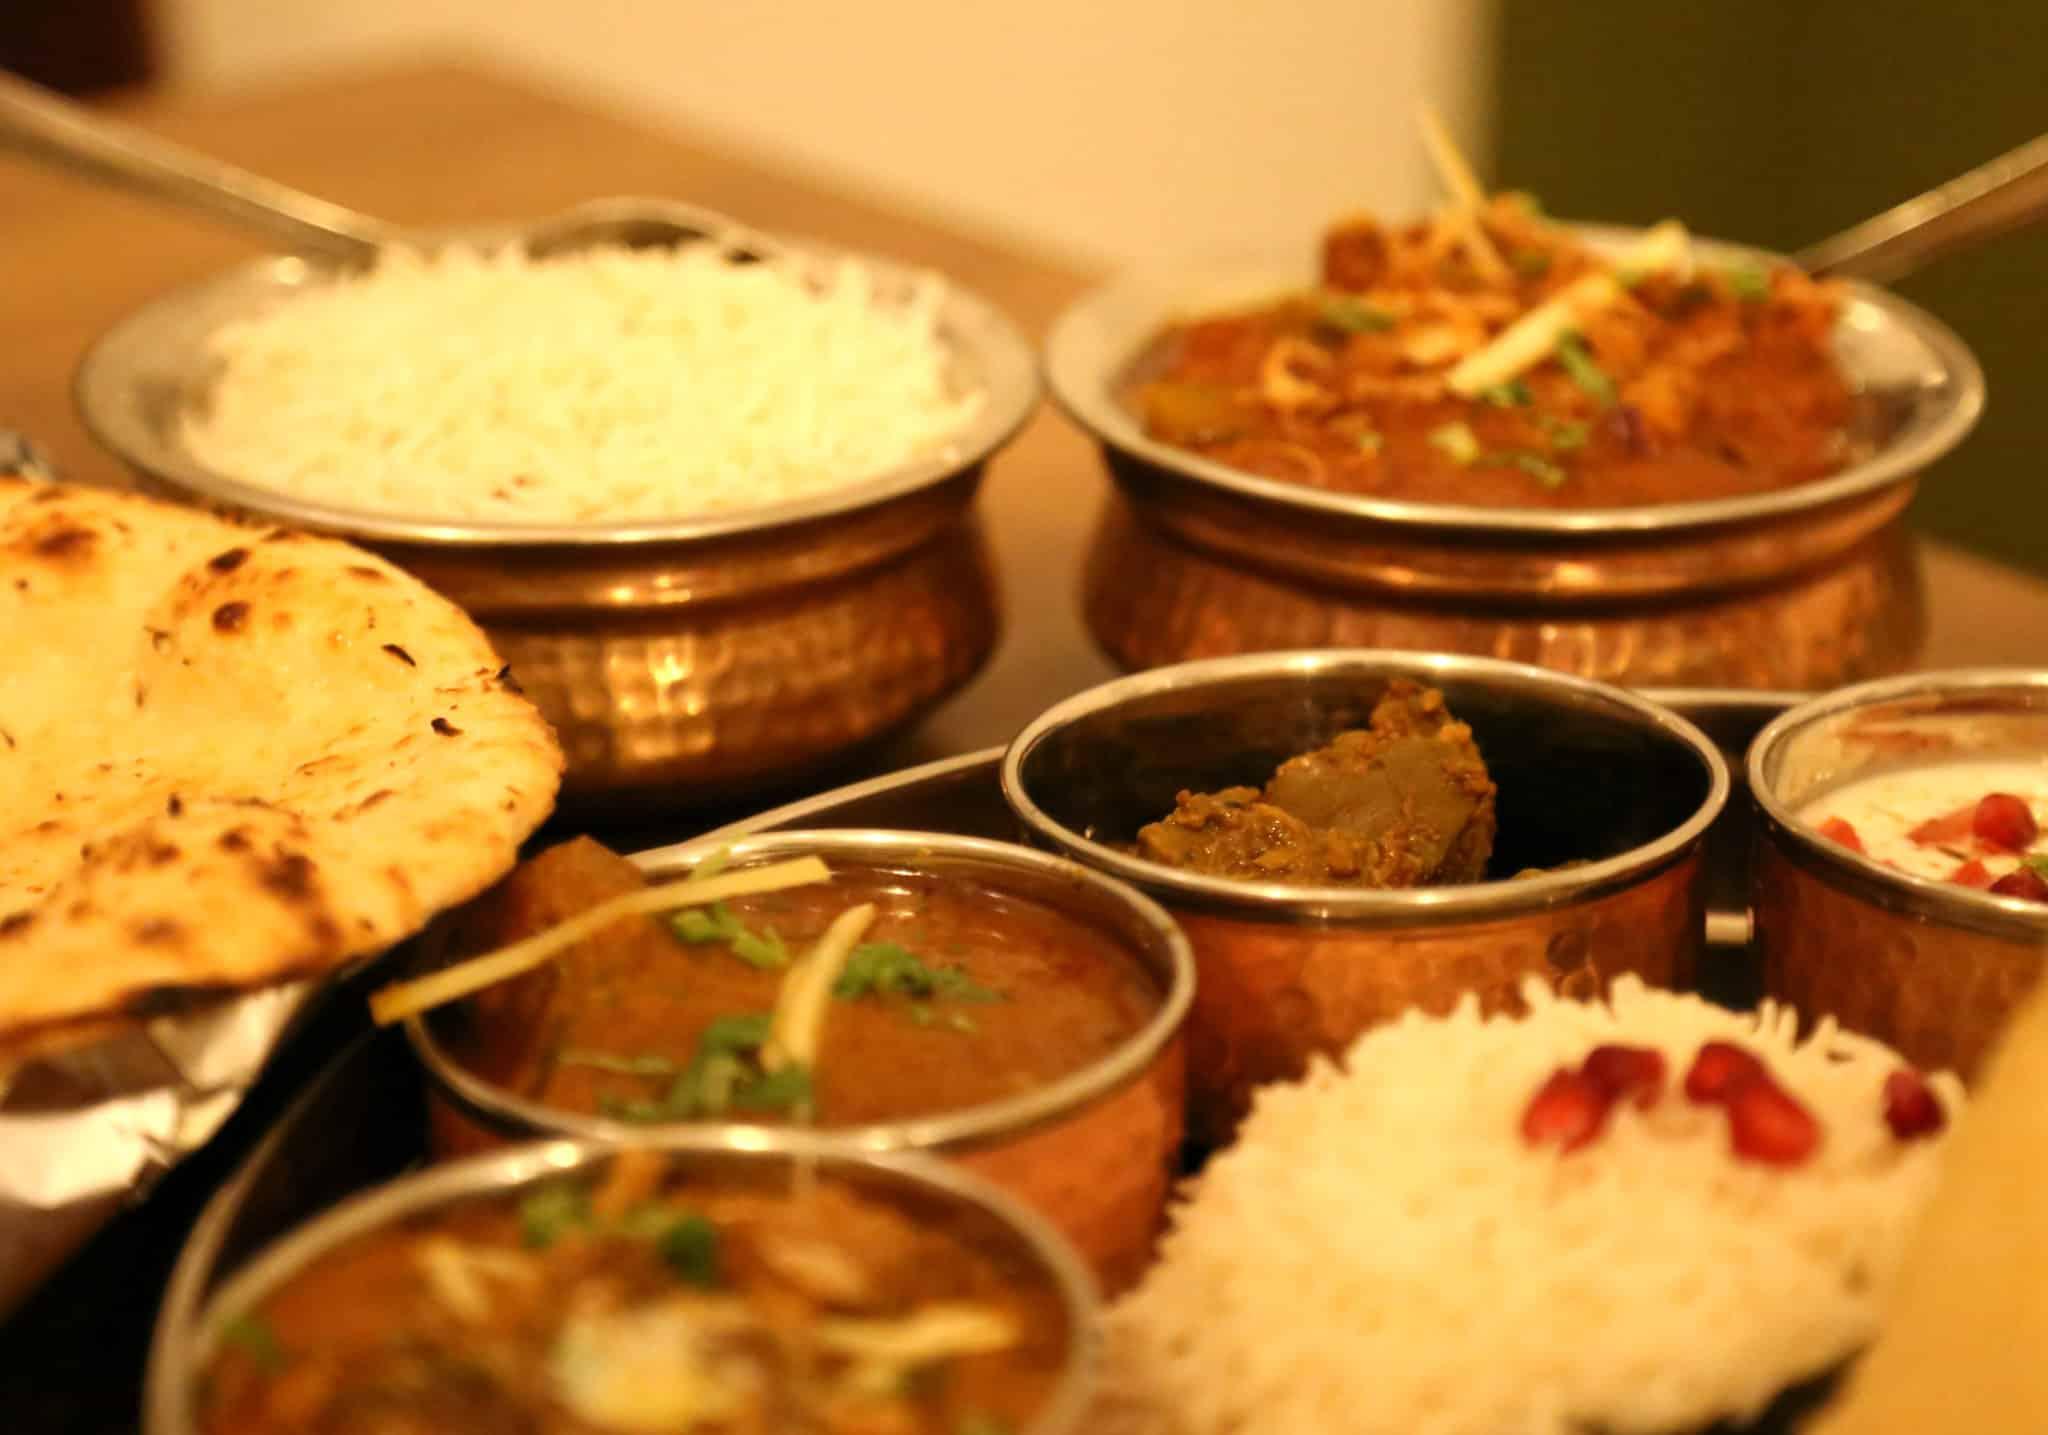 Berlin Loves You Bahadur indian restaurant Tikka Masala